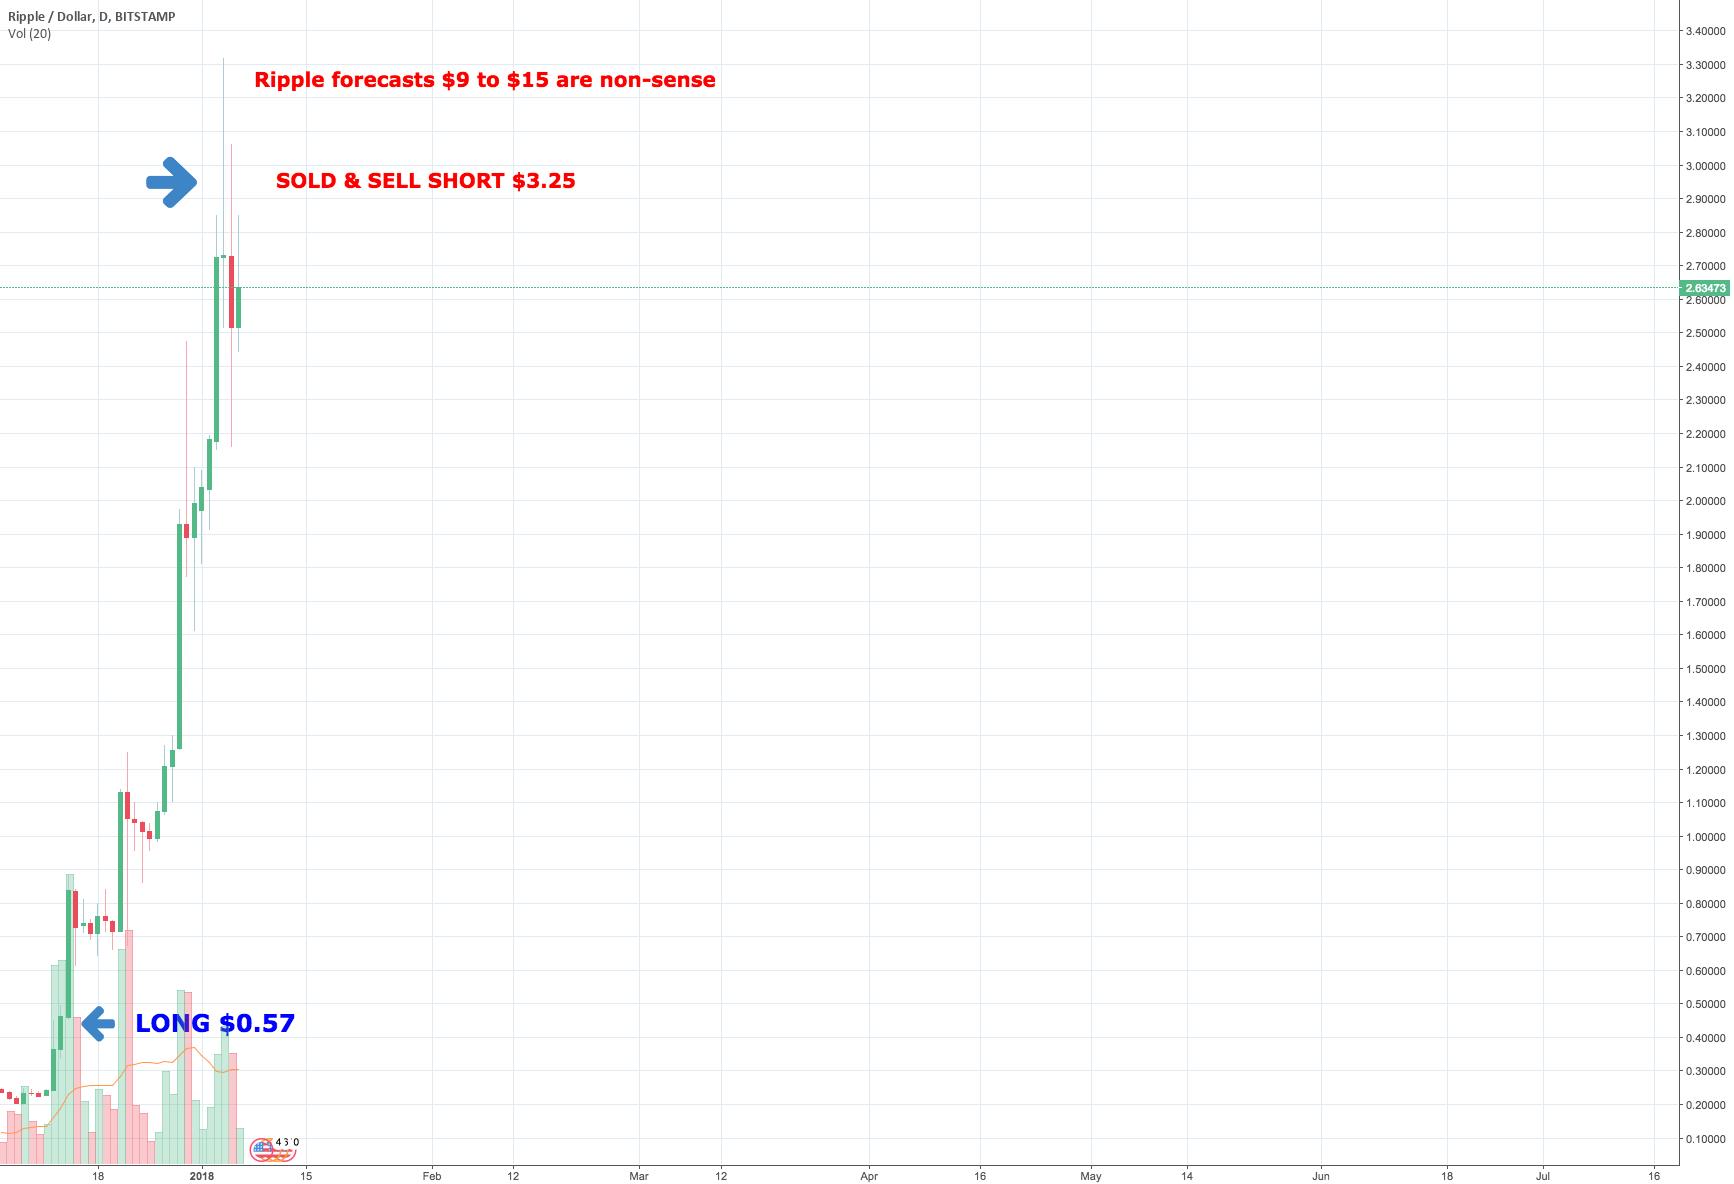 Ripple Forecast Bearish Short $3.25